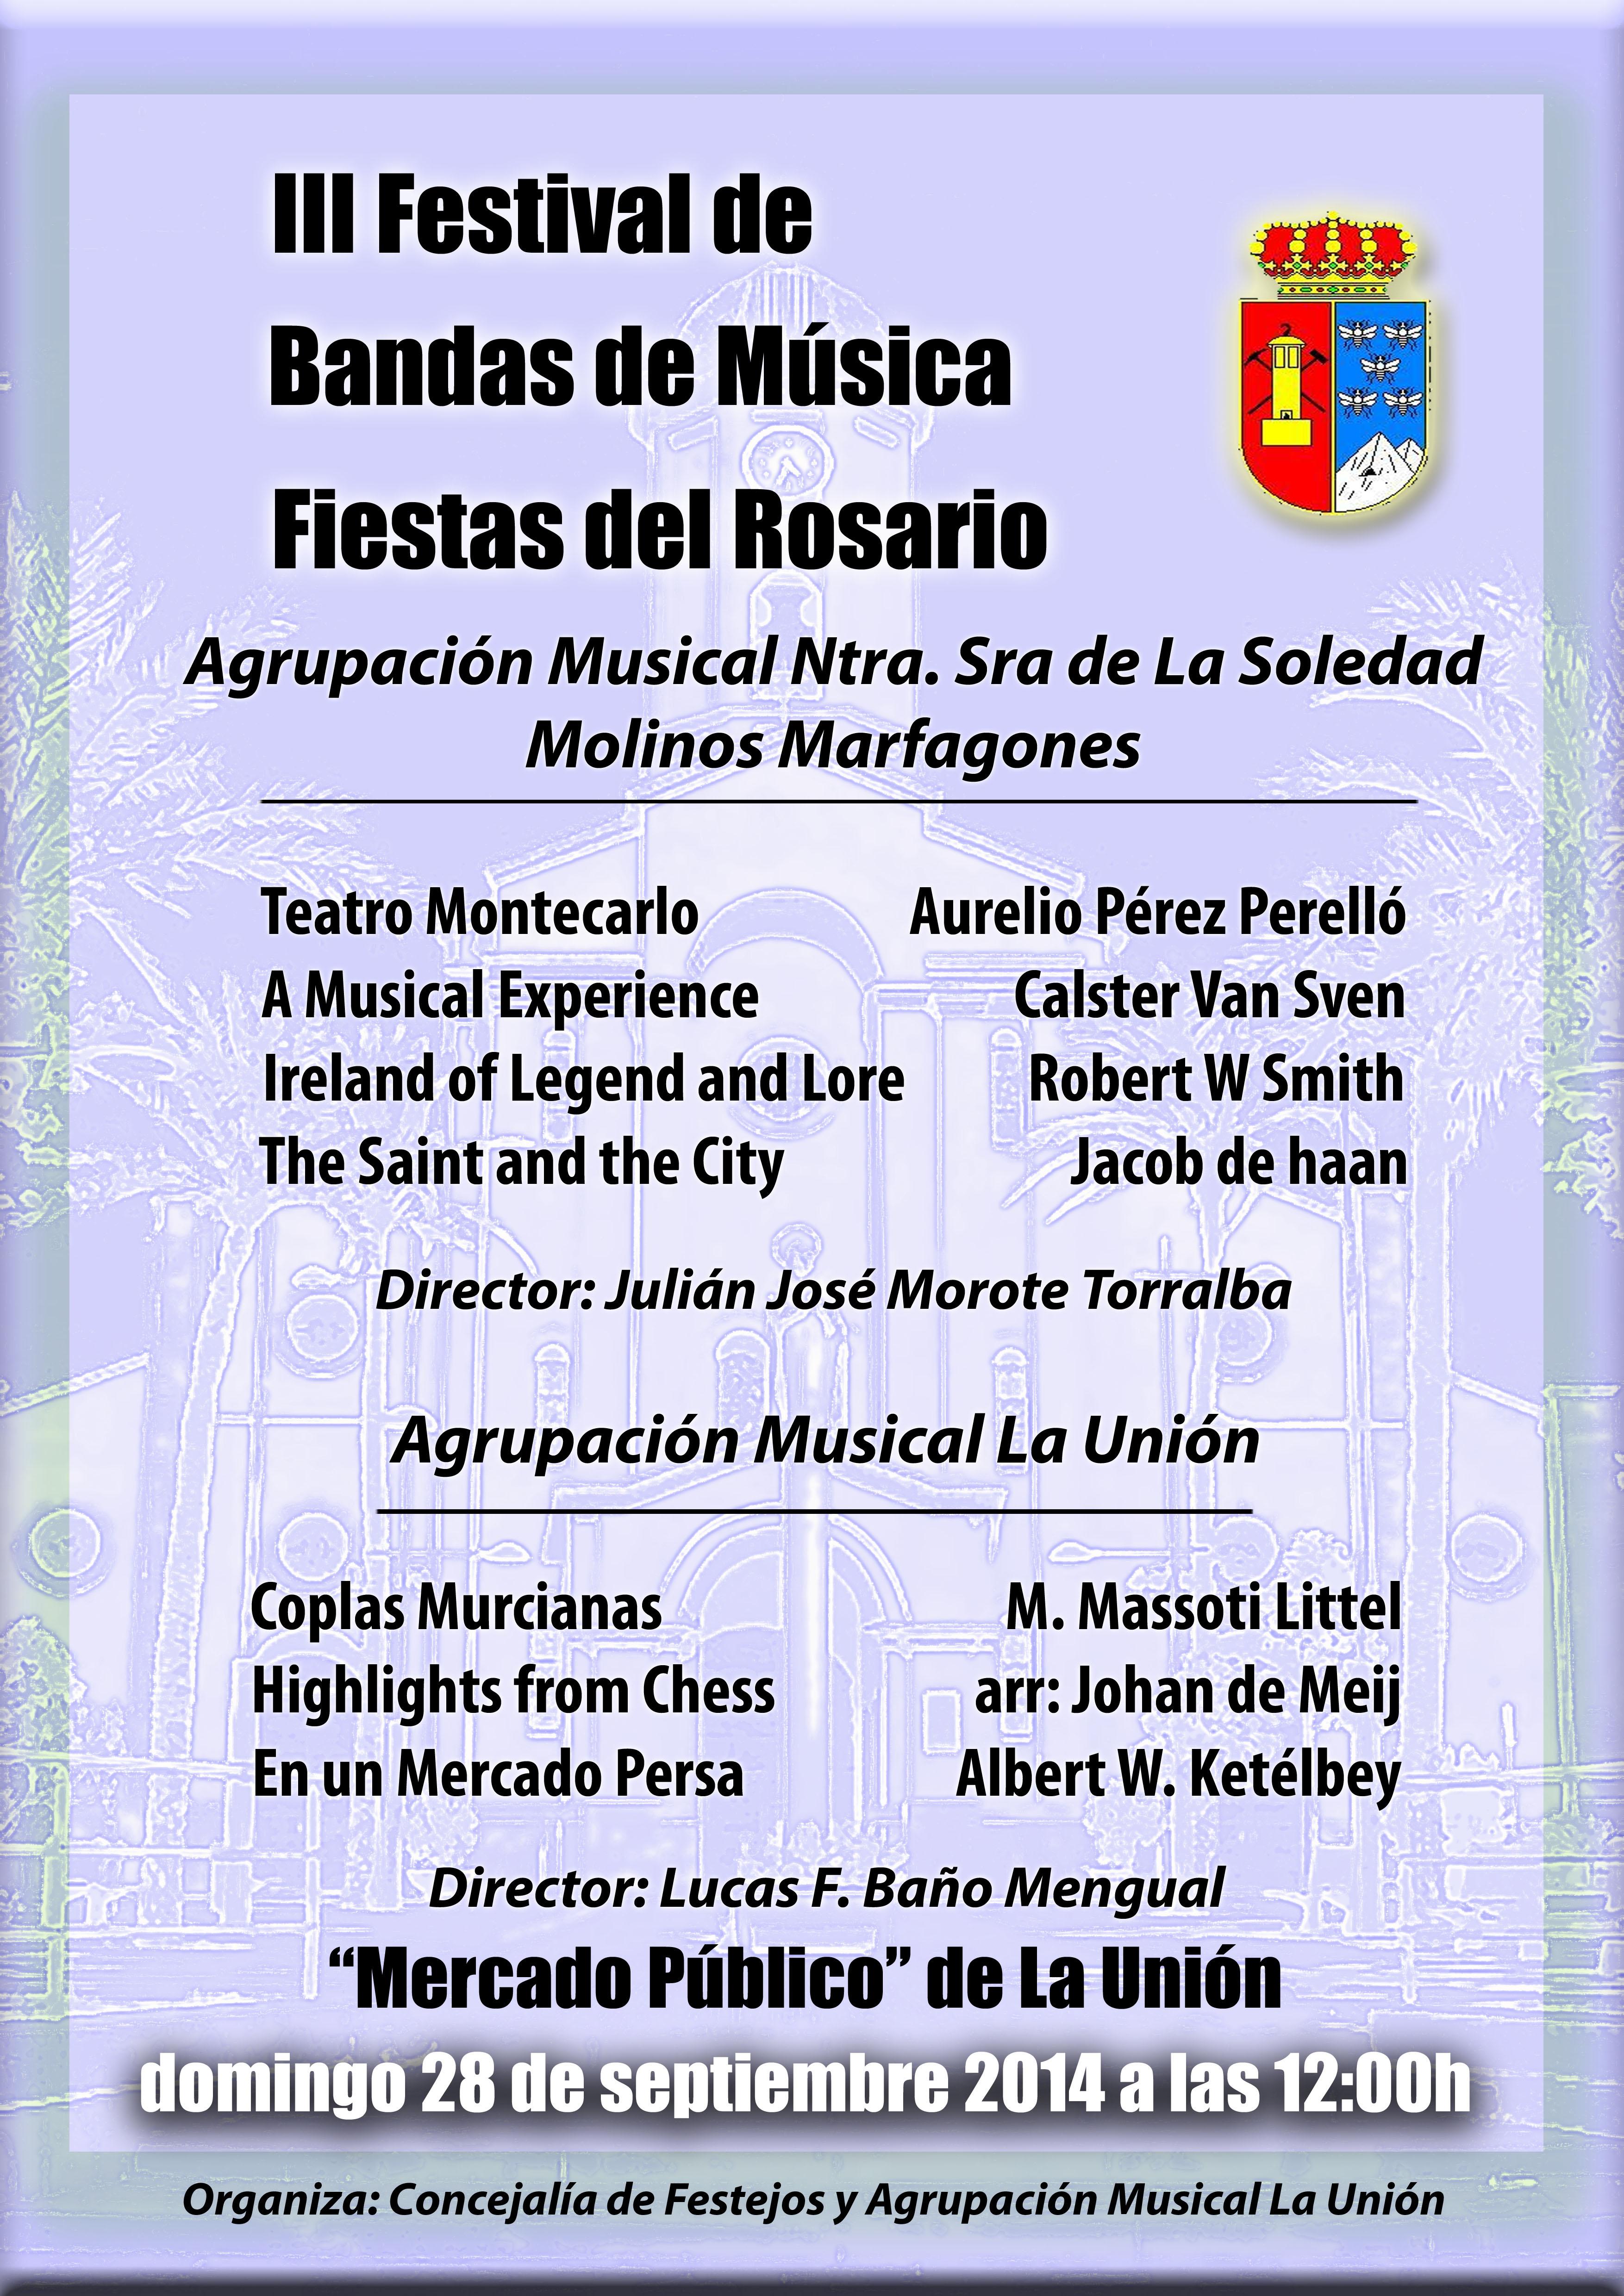 Festival bandas de musica 2014